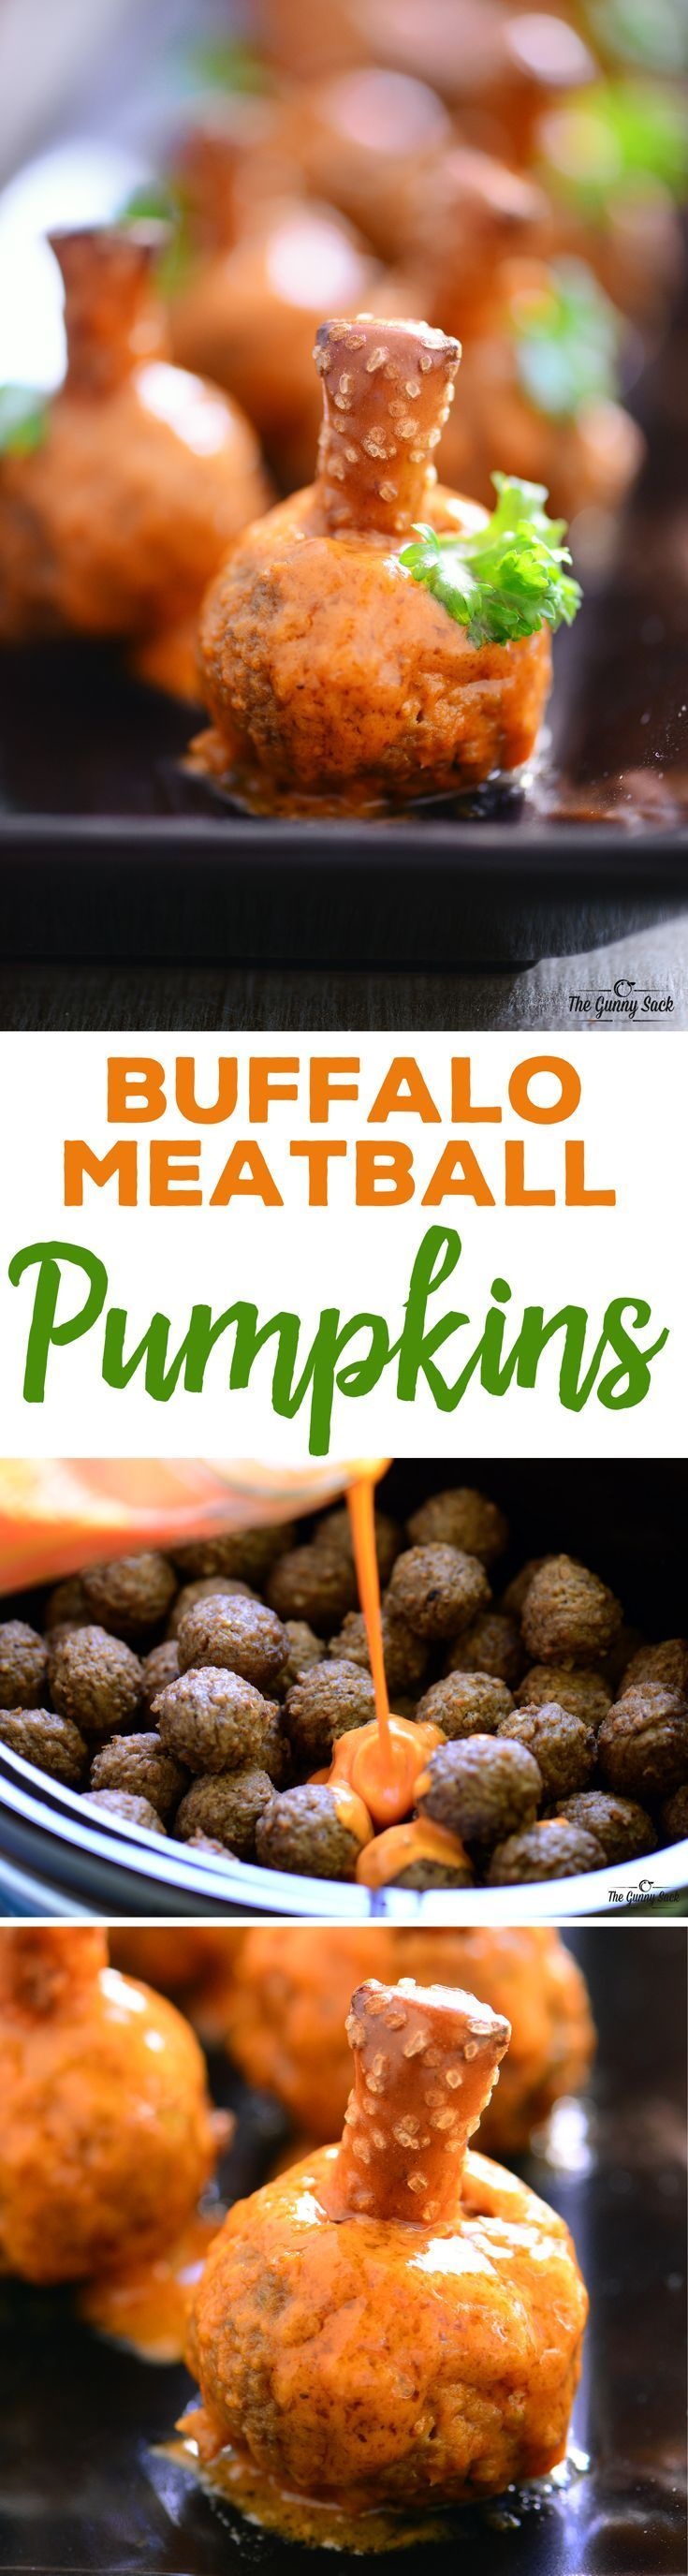 Buffalo Meatball Pumpkins   Recipe   Buffalo meatballs, Pretzels ...